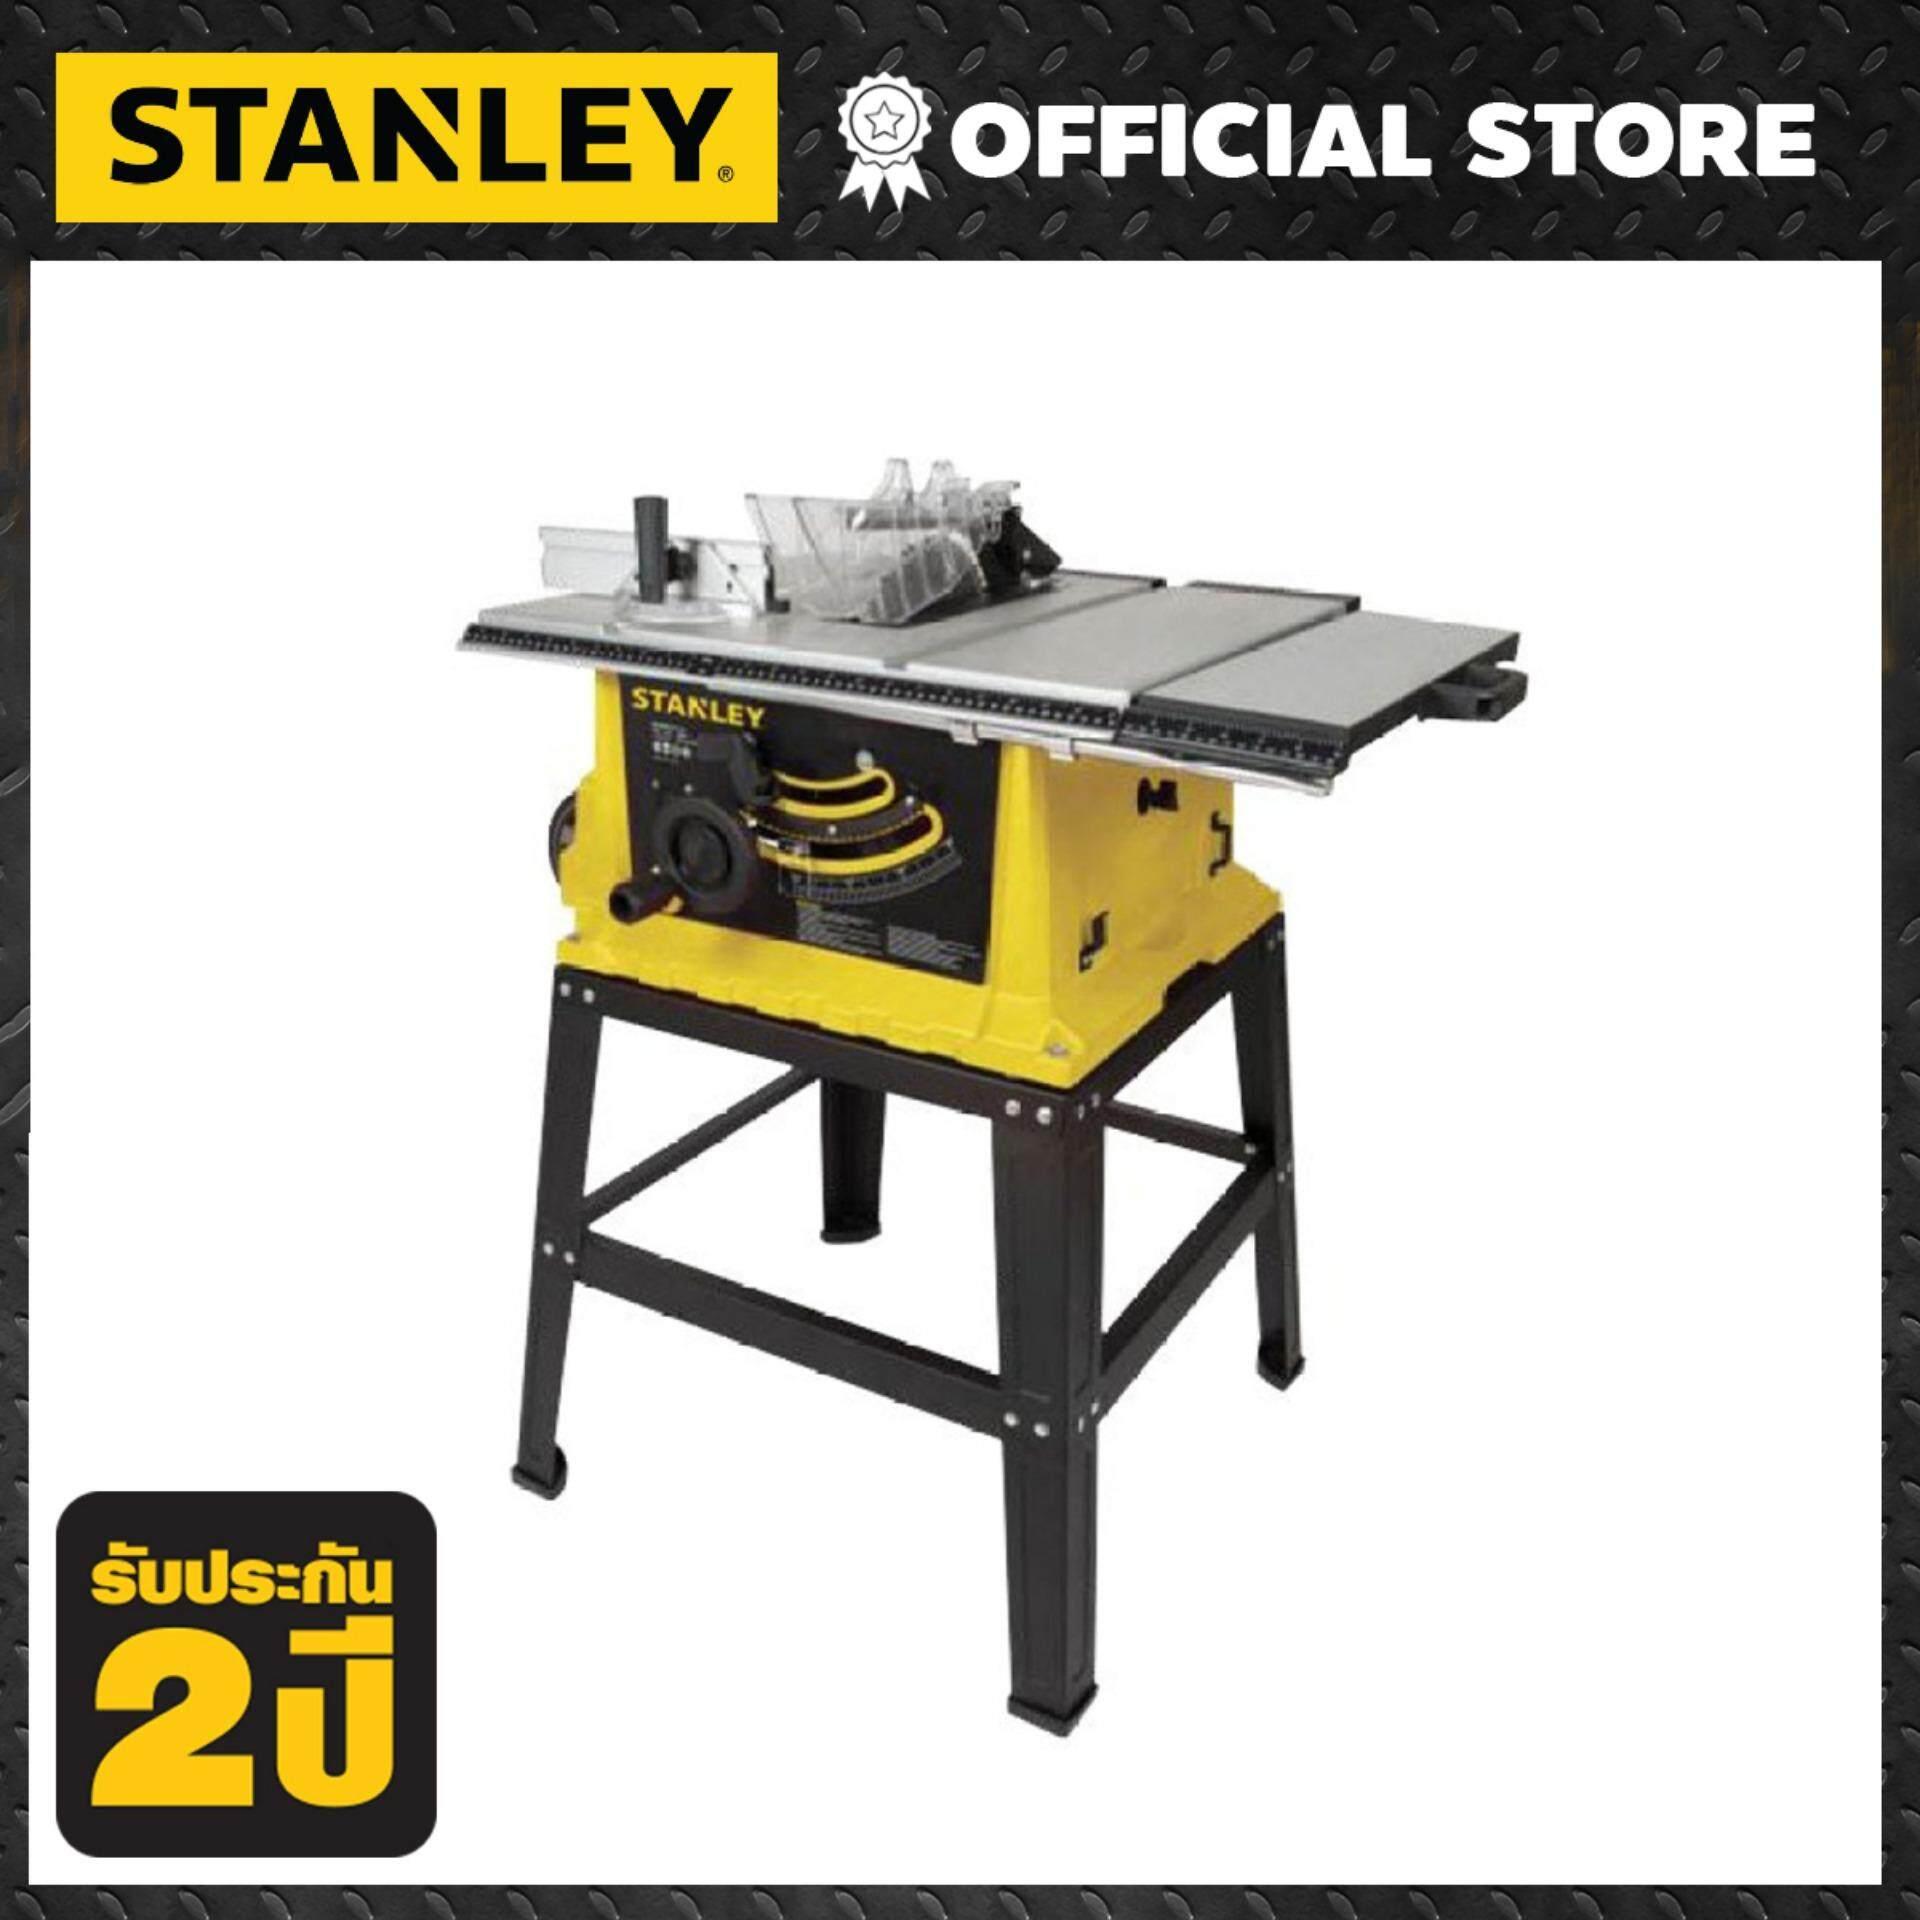 STANLEY โต๊ะแท่นเลื่อยสแตนเลย์ STST1825 10 นิ้ว 1800W รับประกันศูนย์ 2 ปี